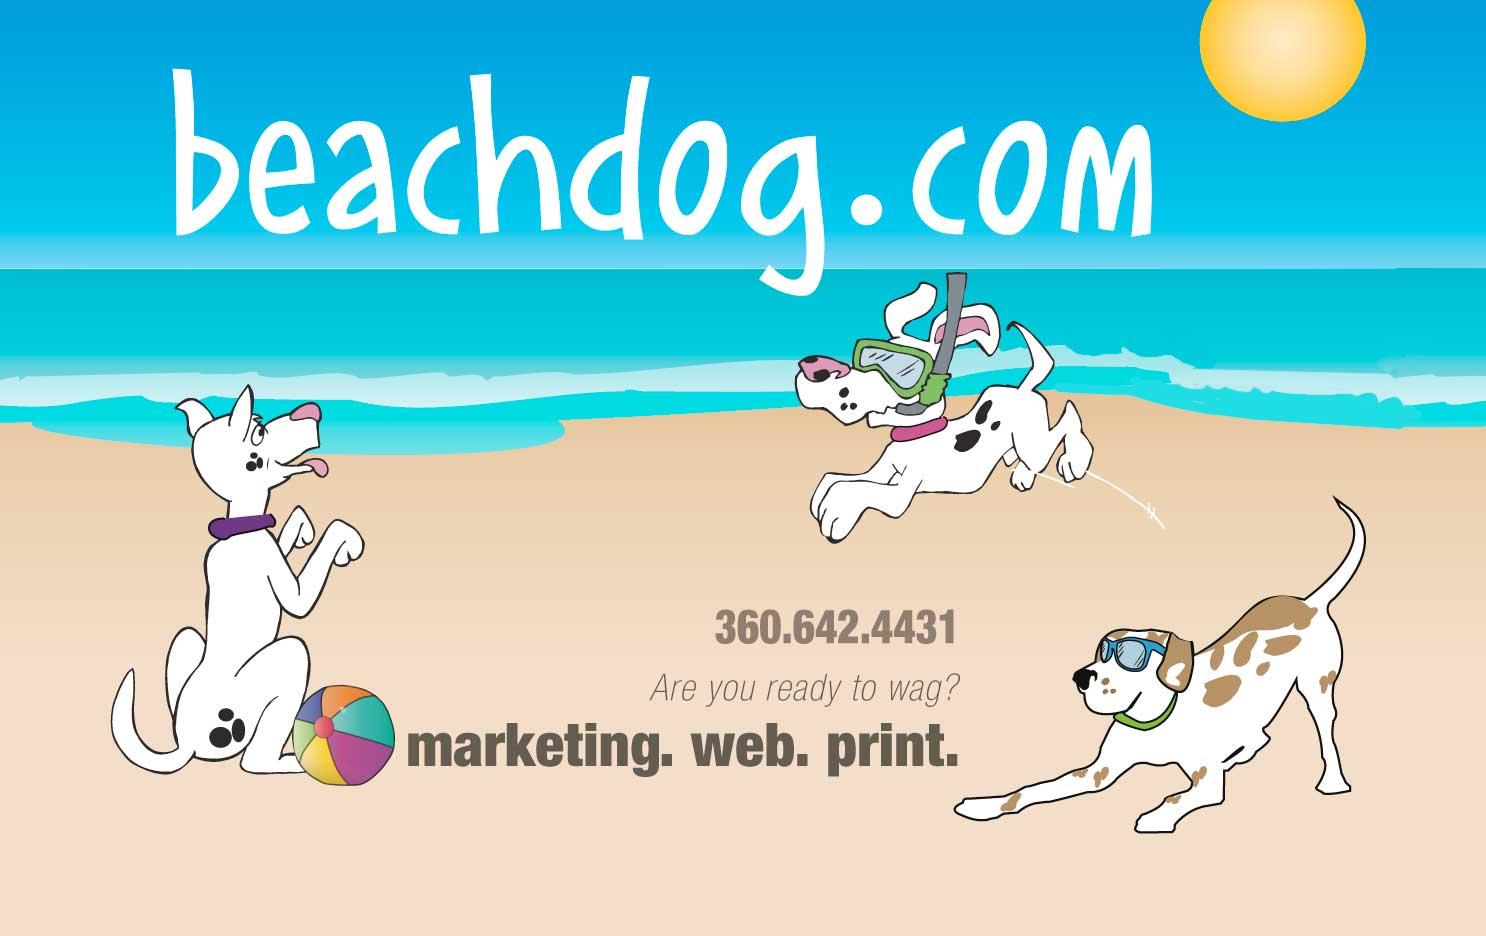 beachdog.com: web. print. marketing